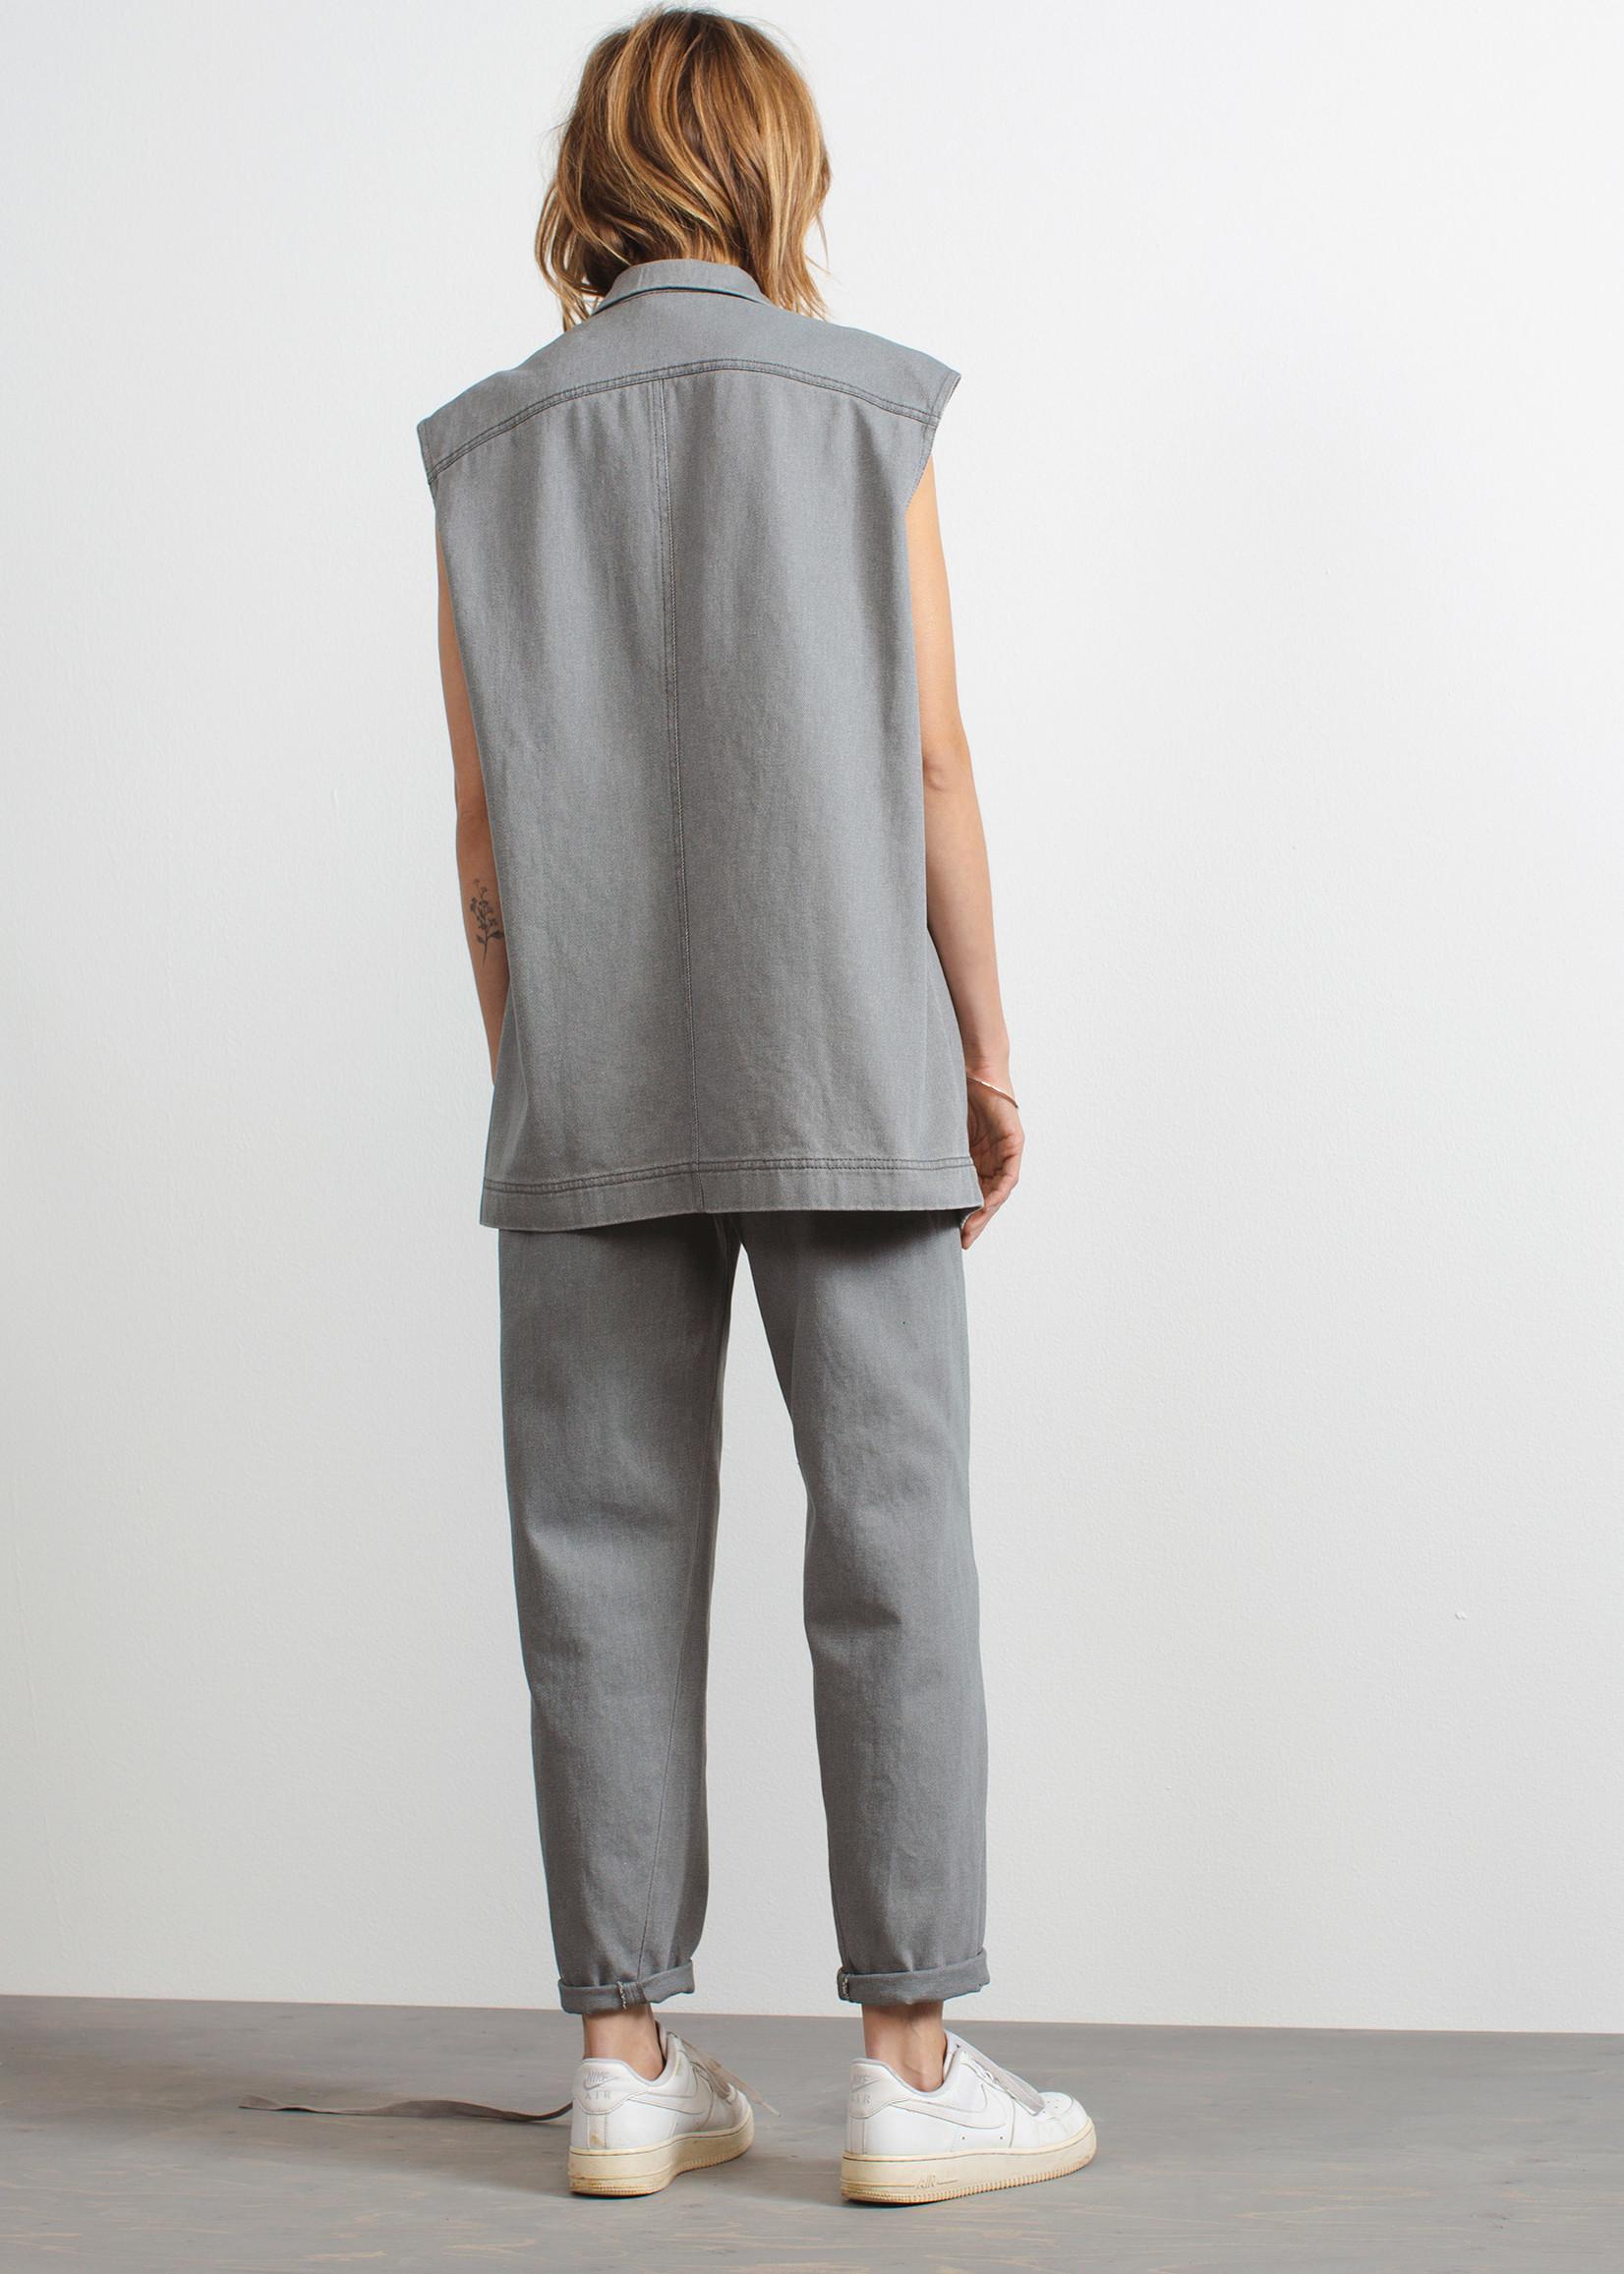 Humanoid Grover Jacket